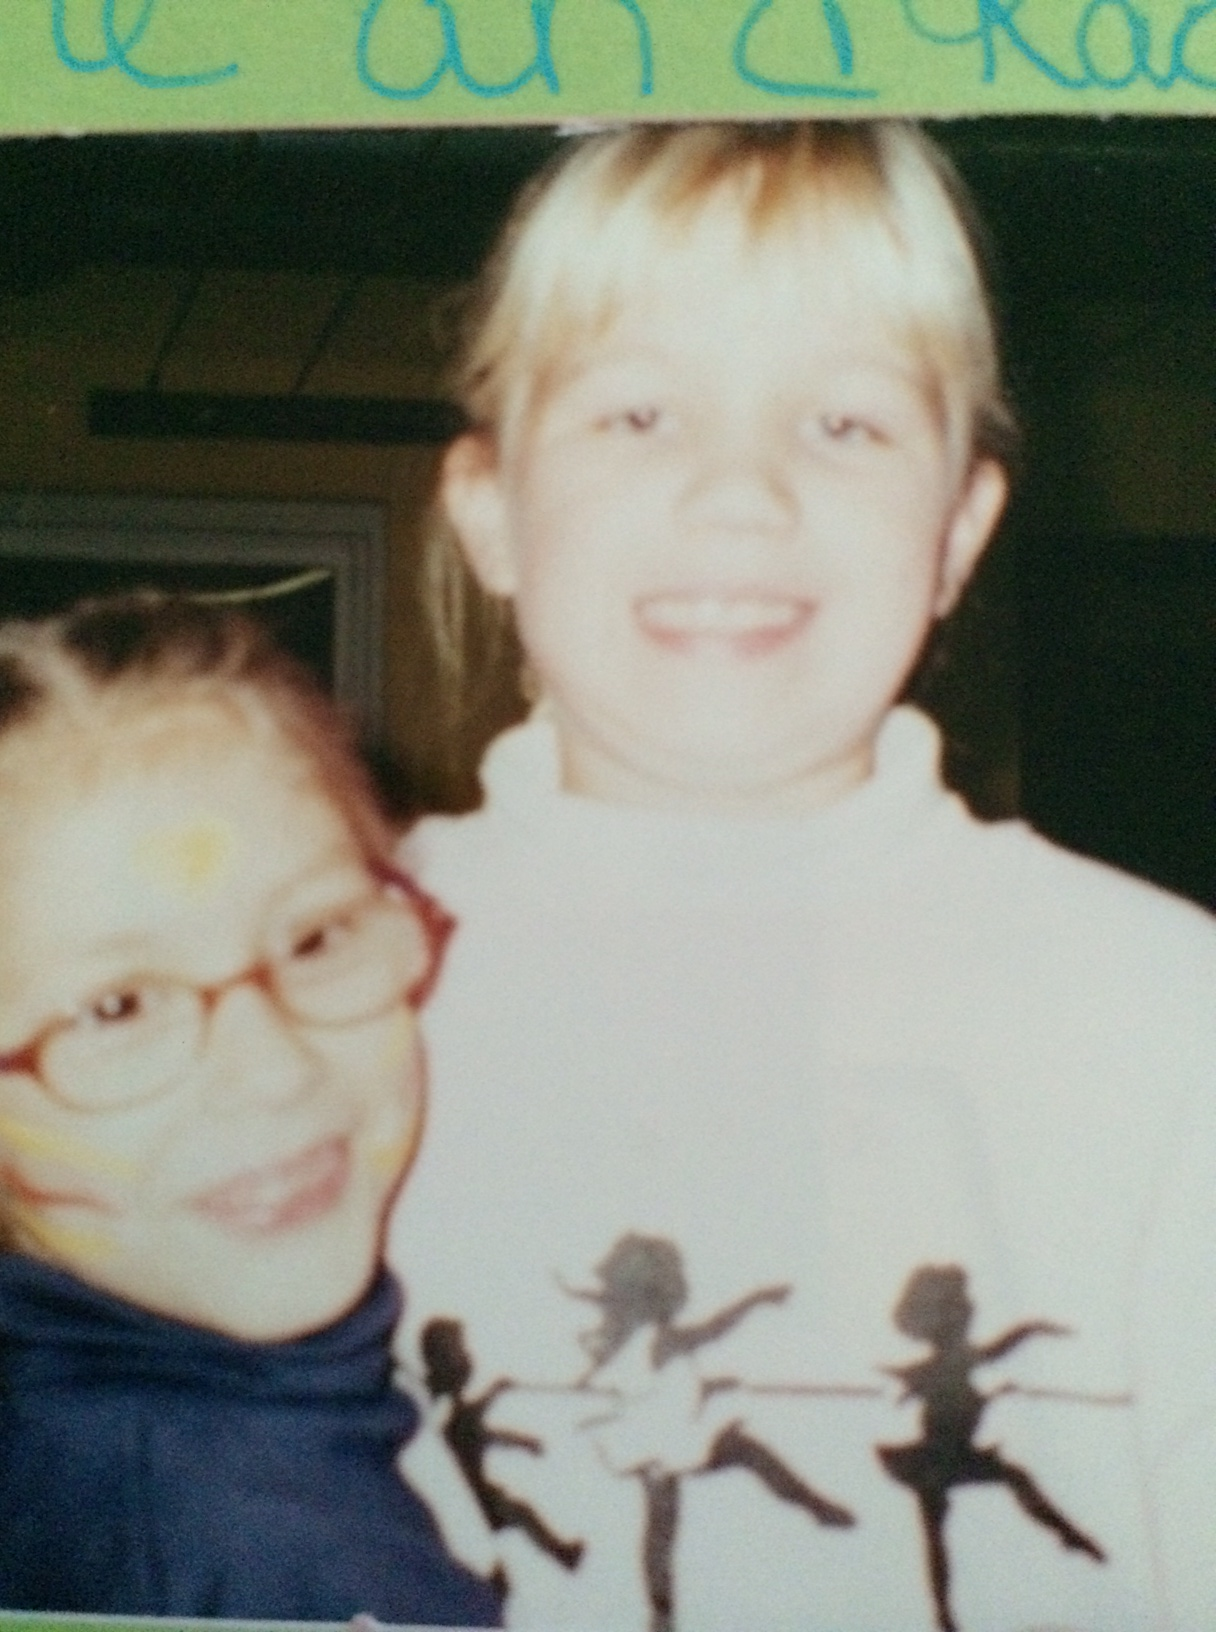 Here's my grade school best friend Rachel and I, around second or third grade.